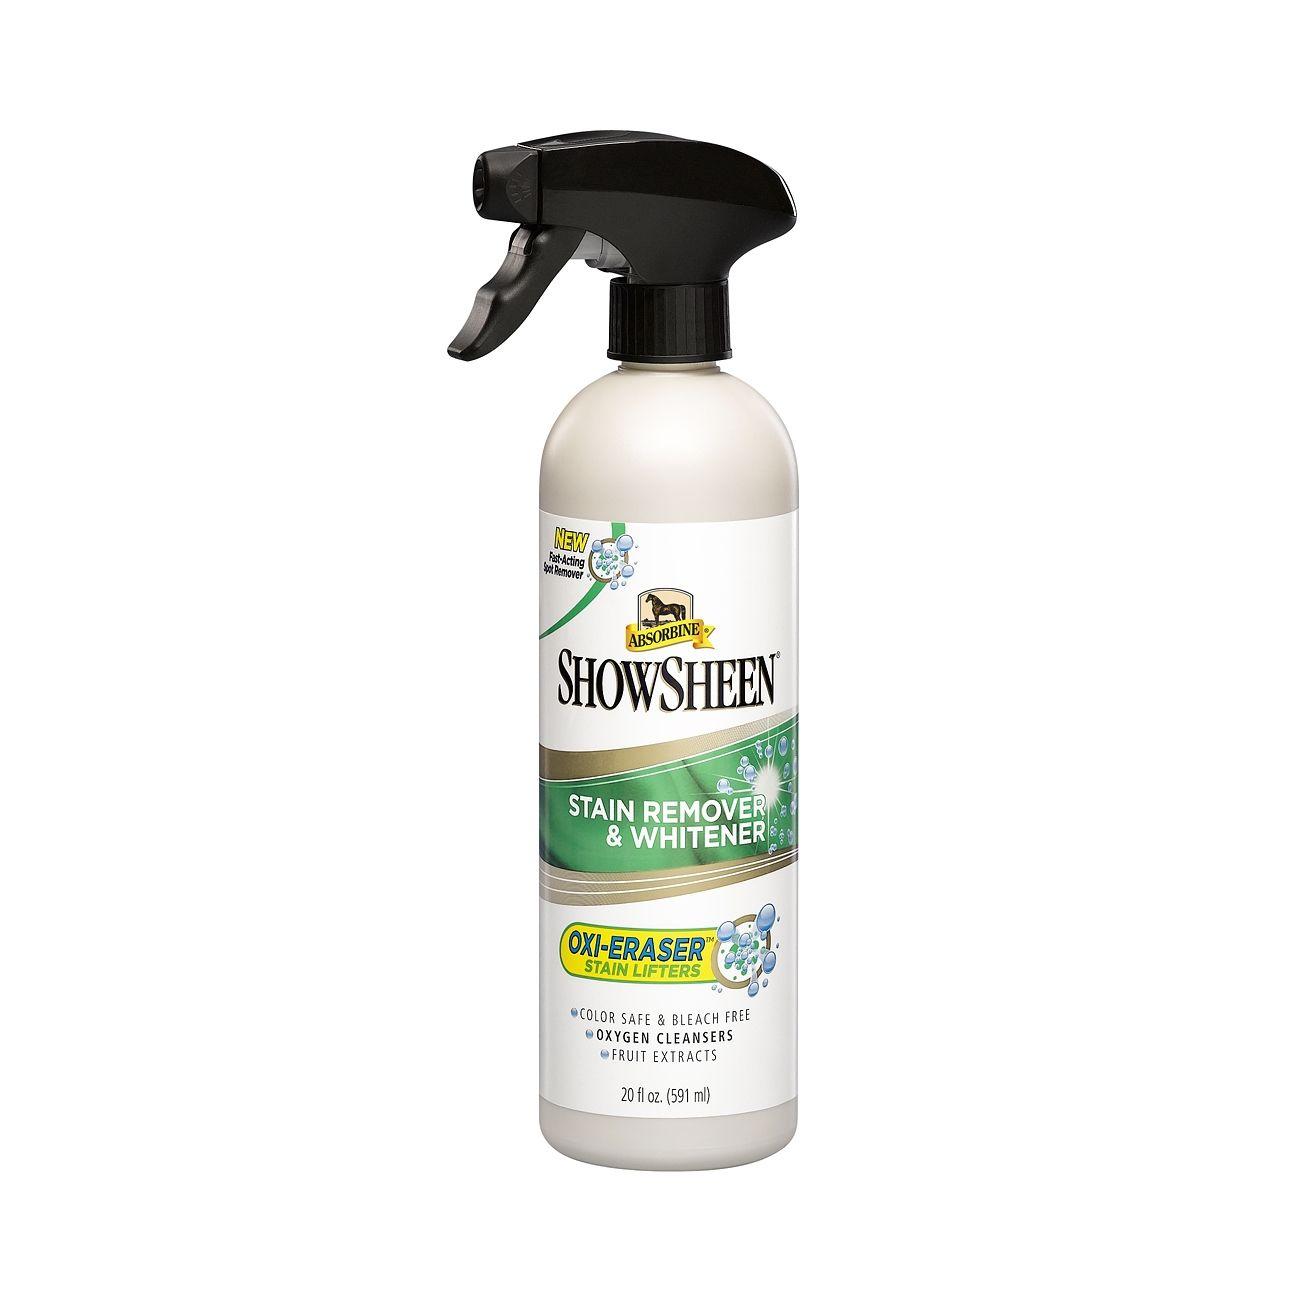 Absorbine ShowSheen Stain Remover & Whitener 591 ml